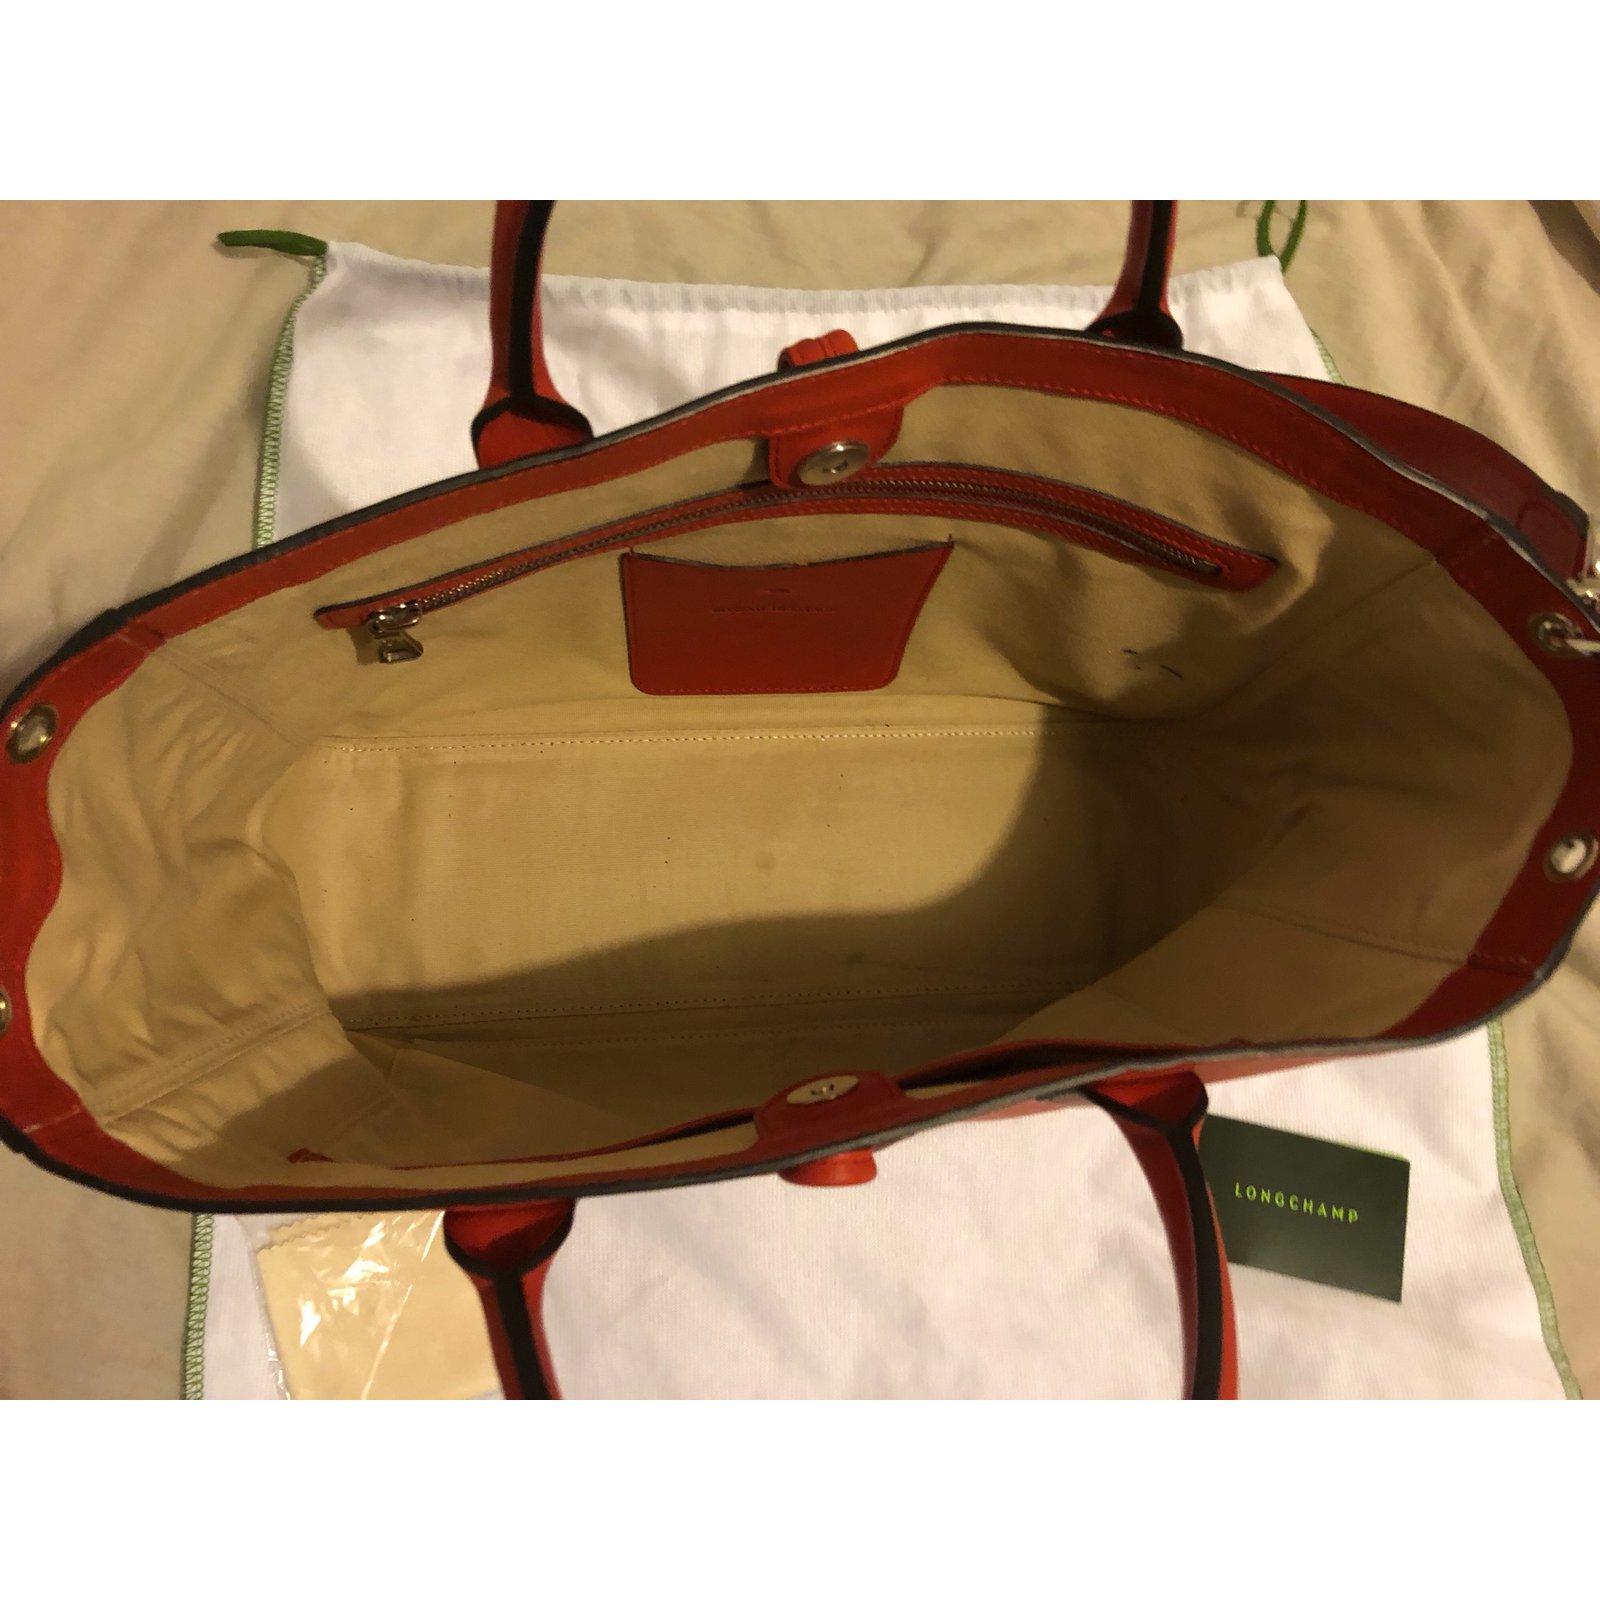 Cuir Closet Longchamp Ref 72553 Heritage Joli Main Corail Roseau À Sacs XEqCvv